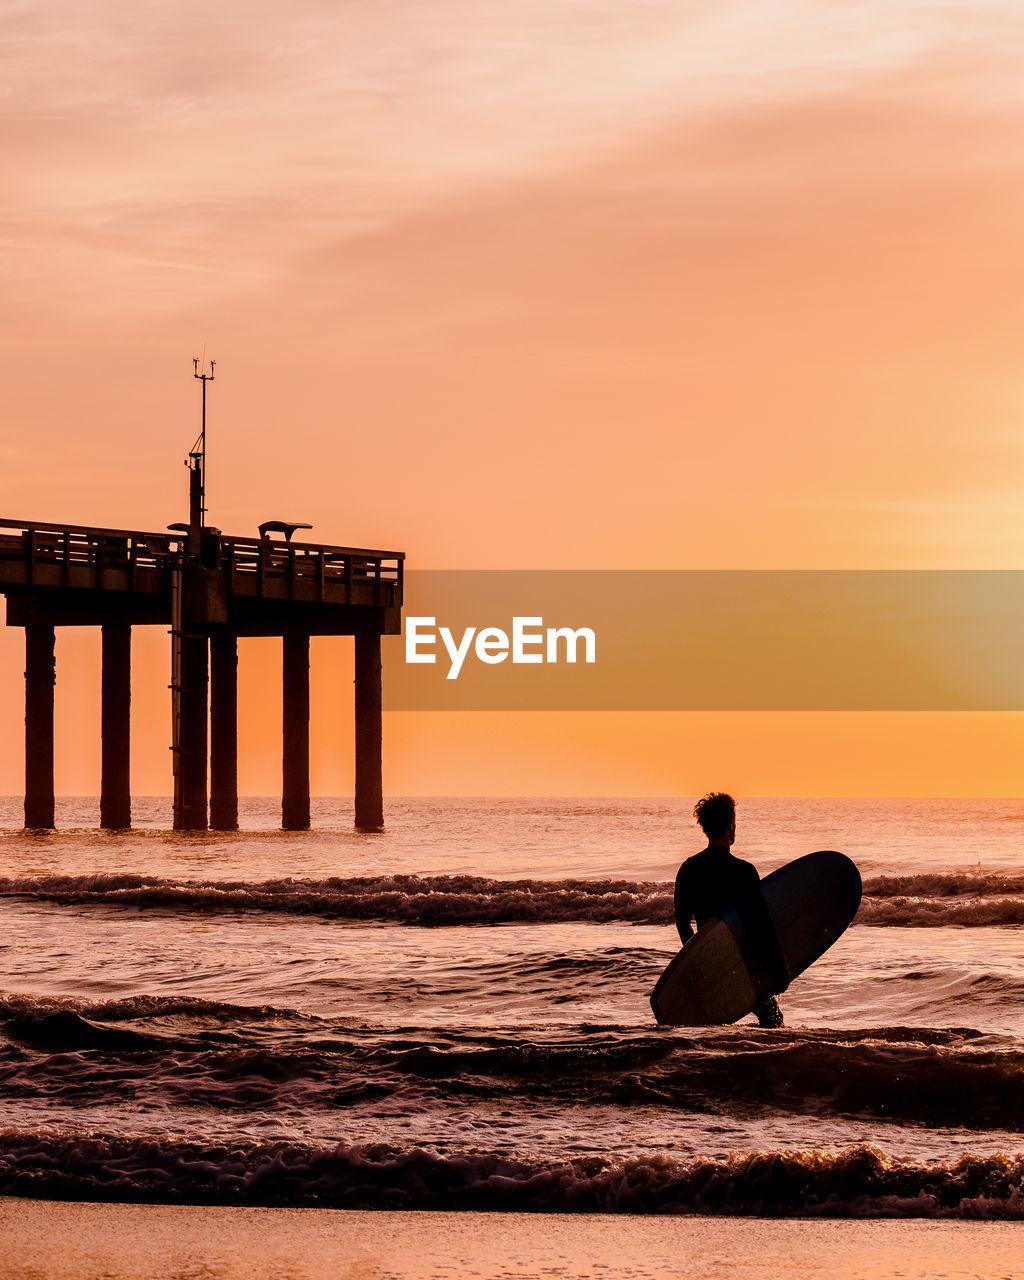 SILHOUETTE MAN ON BEACH AGAINST ORANGE SKY